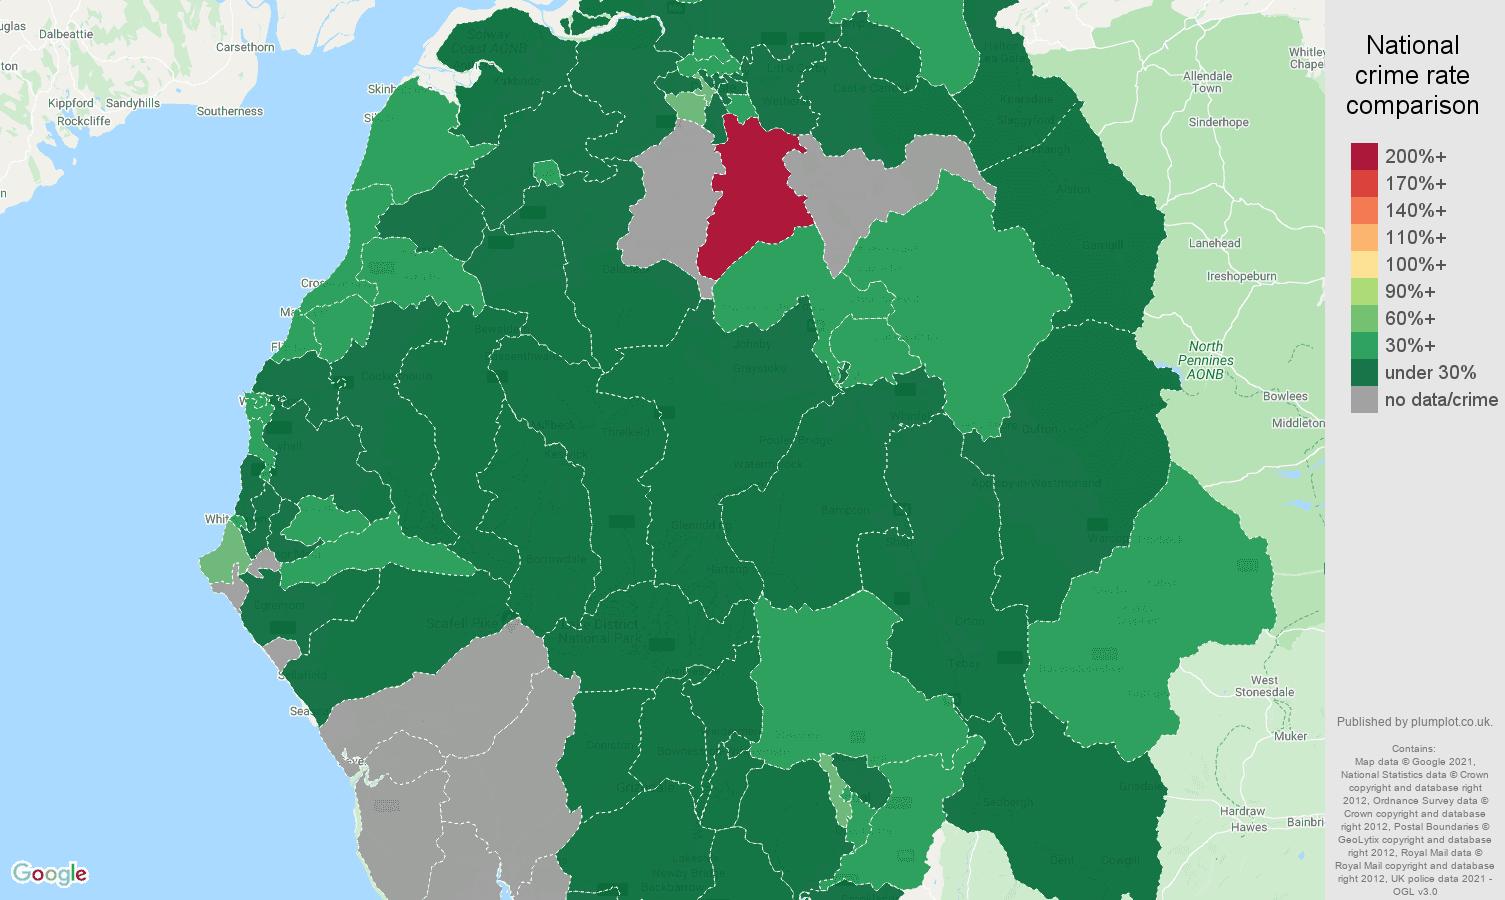 Cumbria vehicle crime rate comparison map